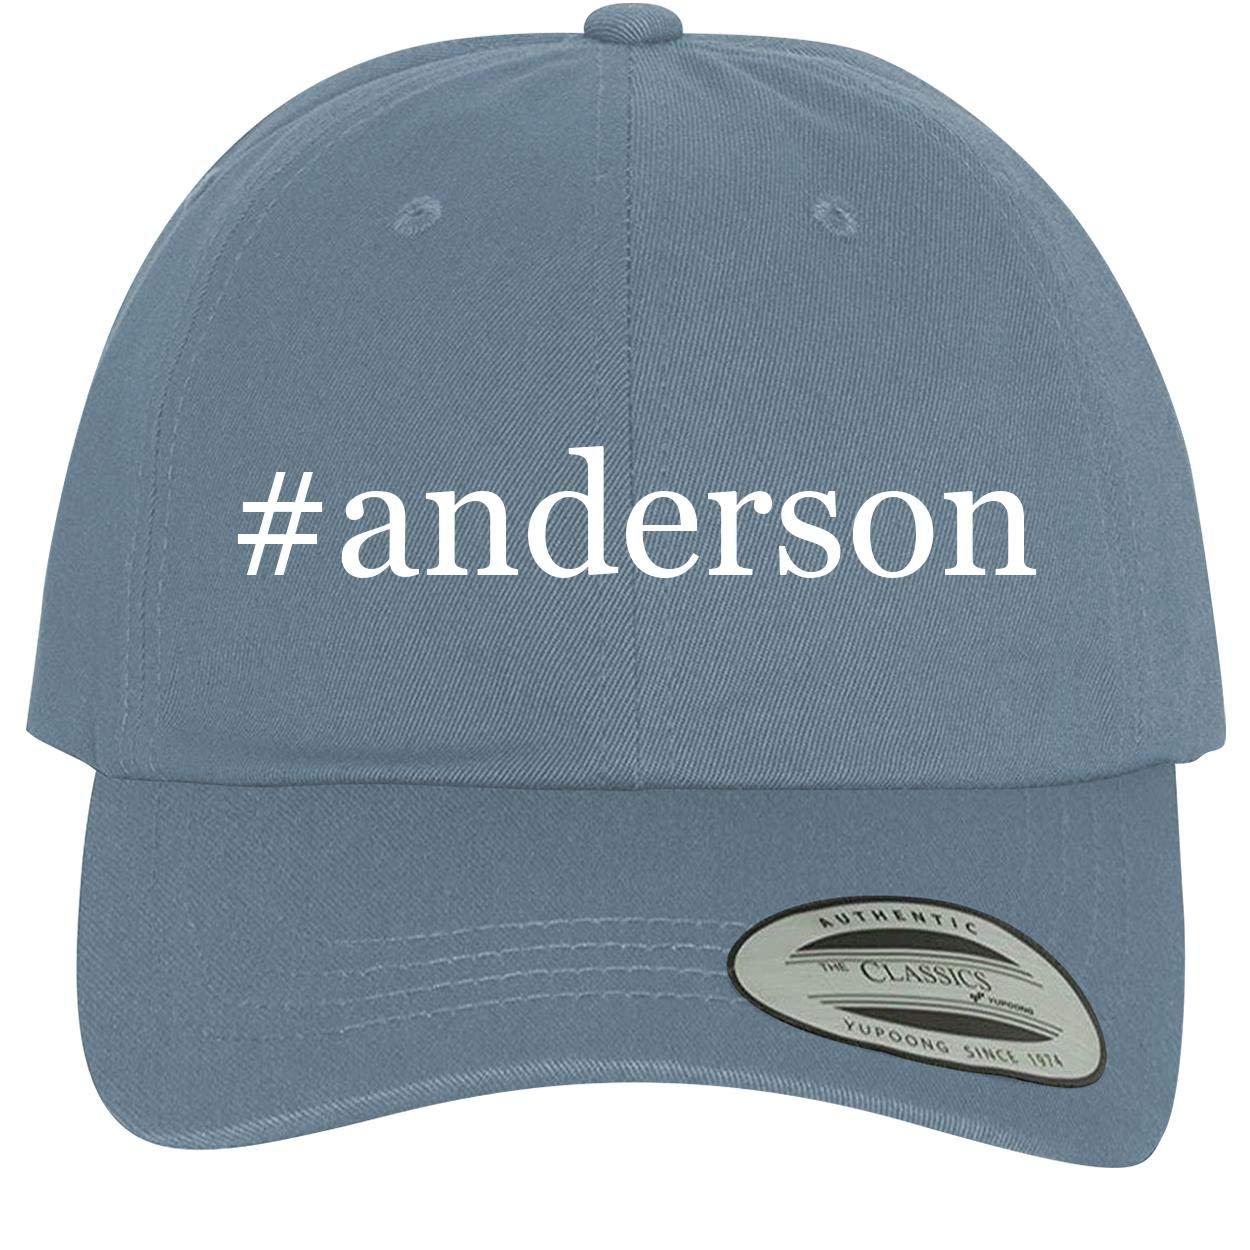 Comfortable Dad Hat Baseball Cap BH Cool Designs #Anderson